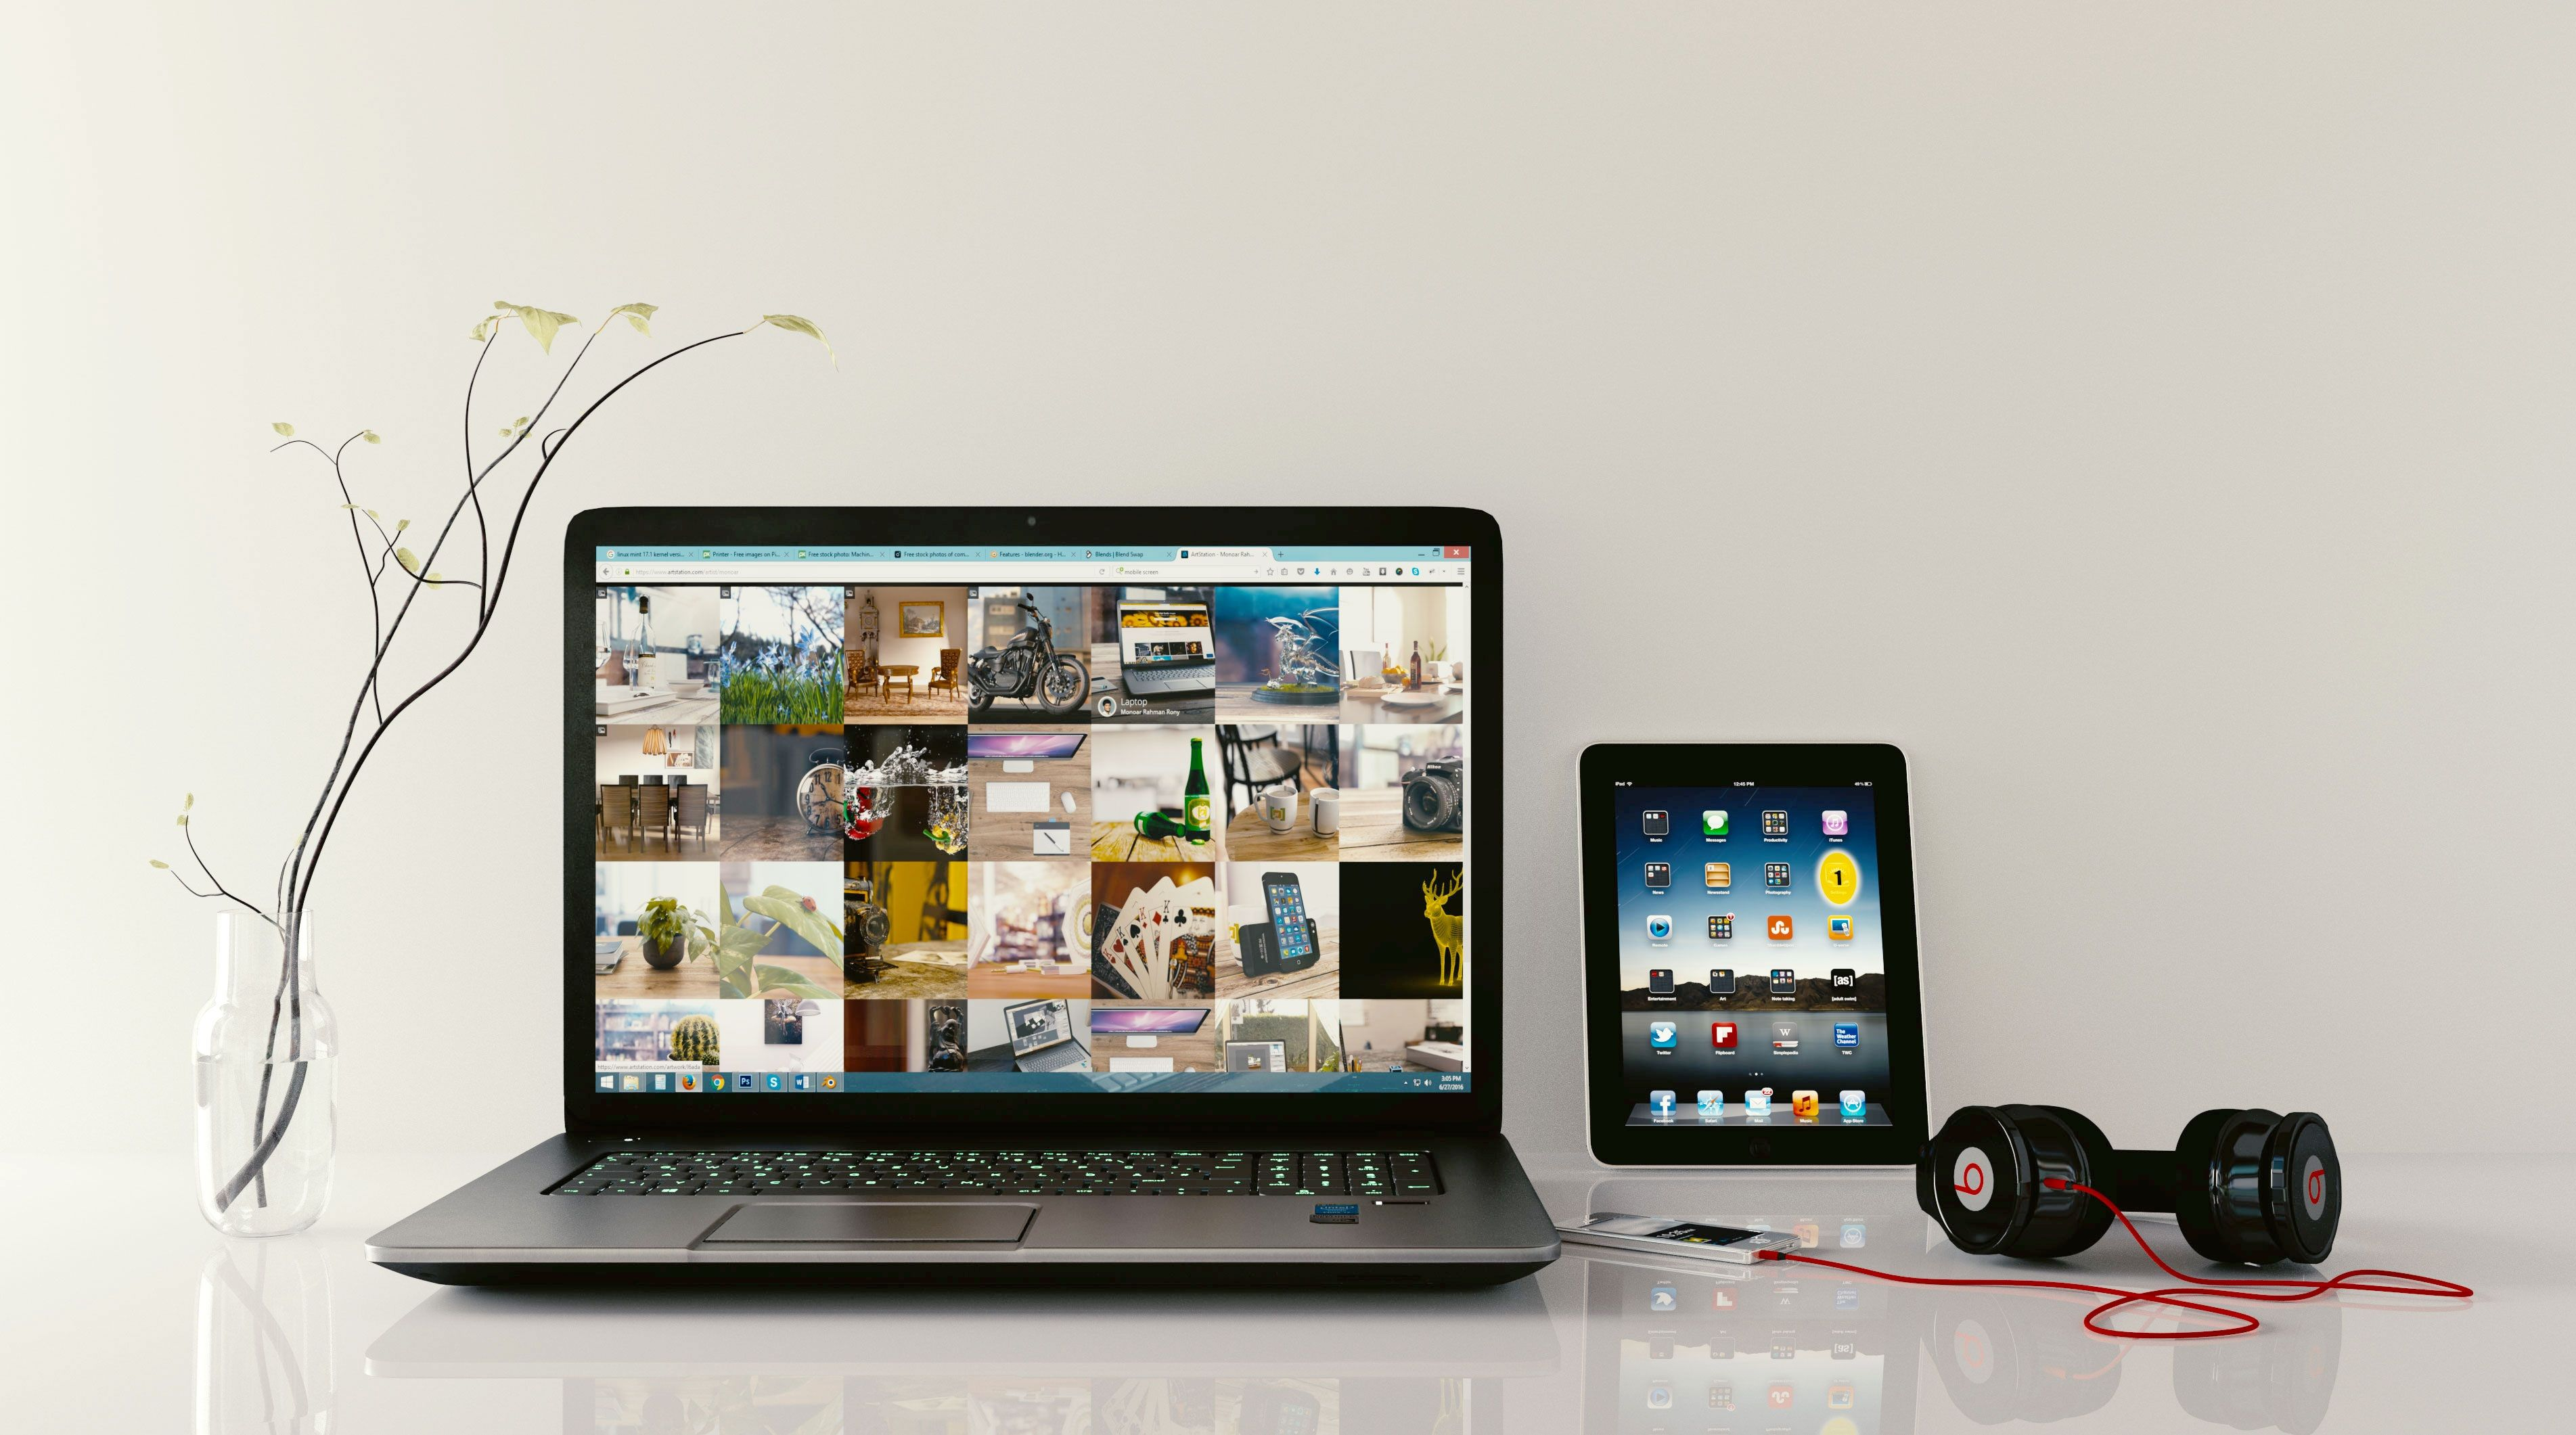 Wallpapers multimedia, audio equipment, business